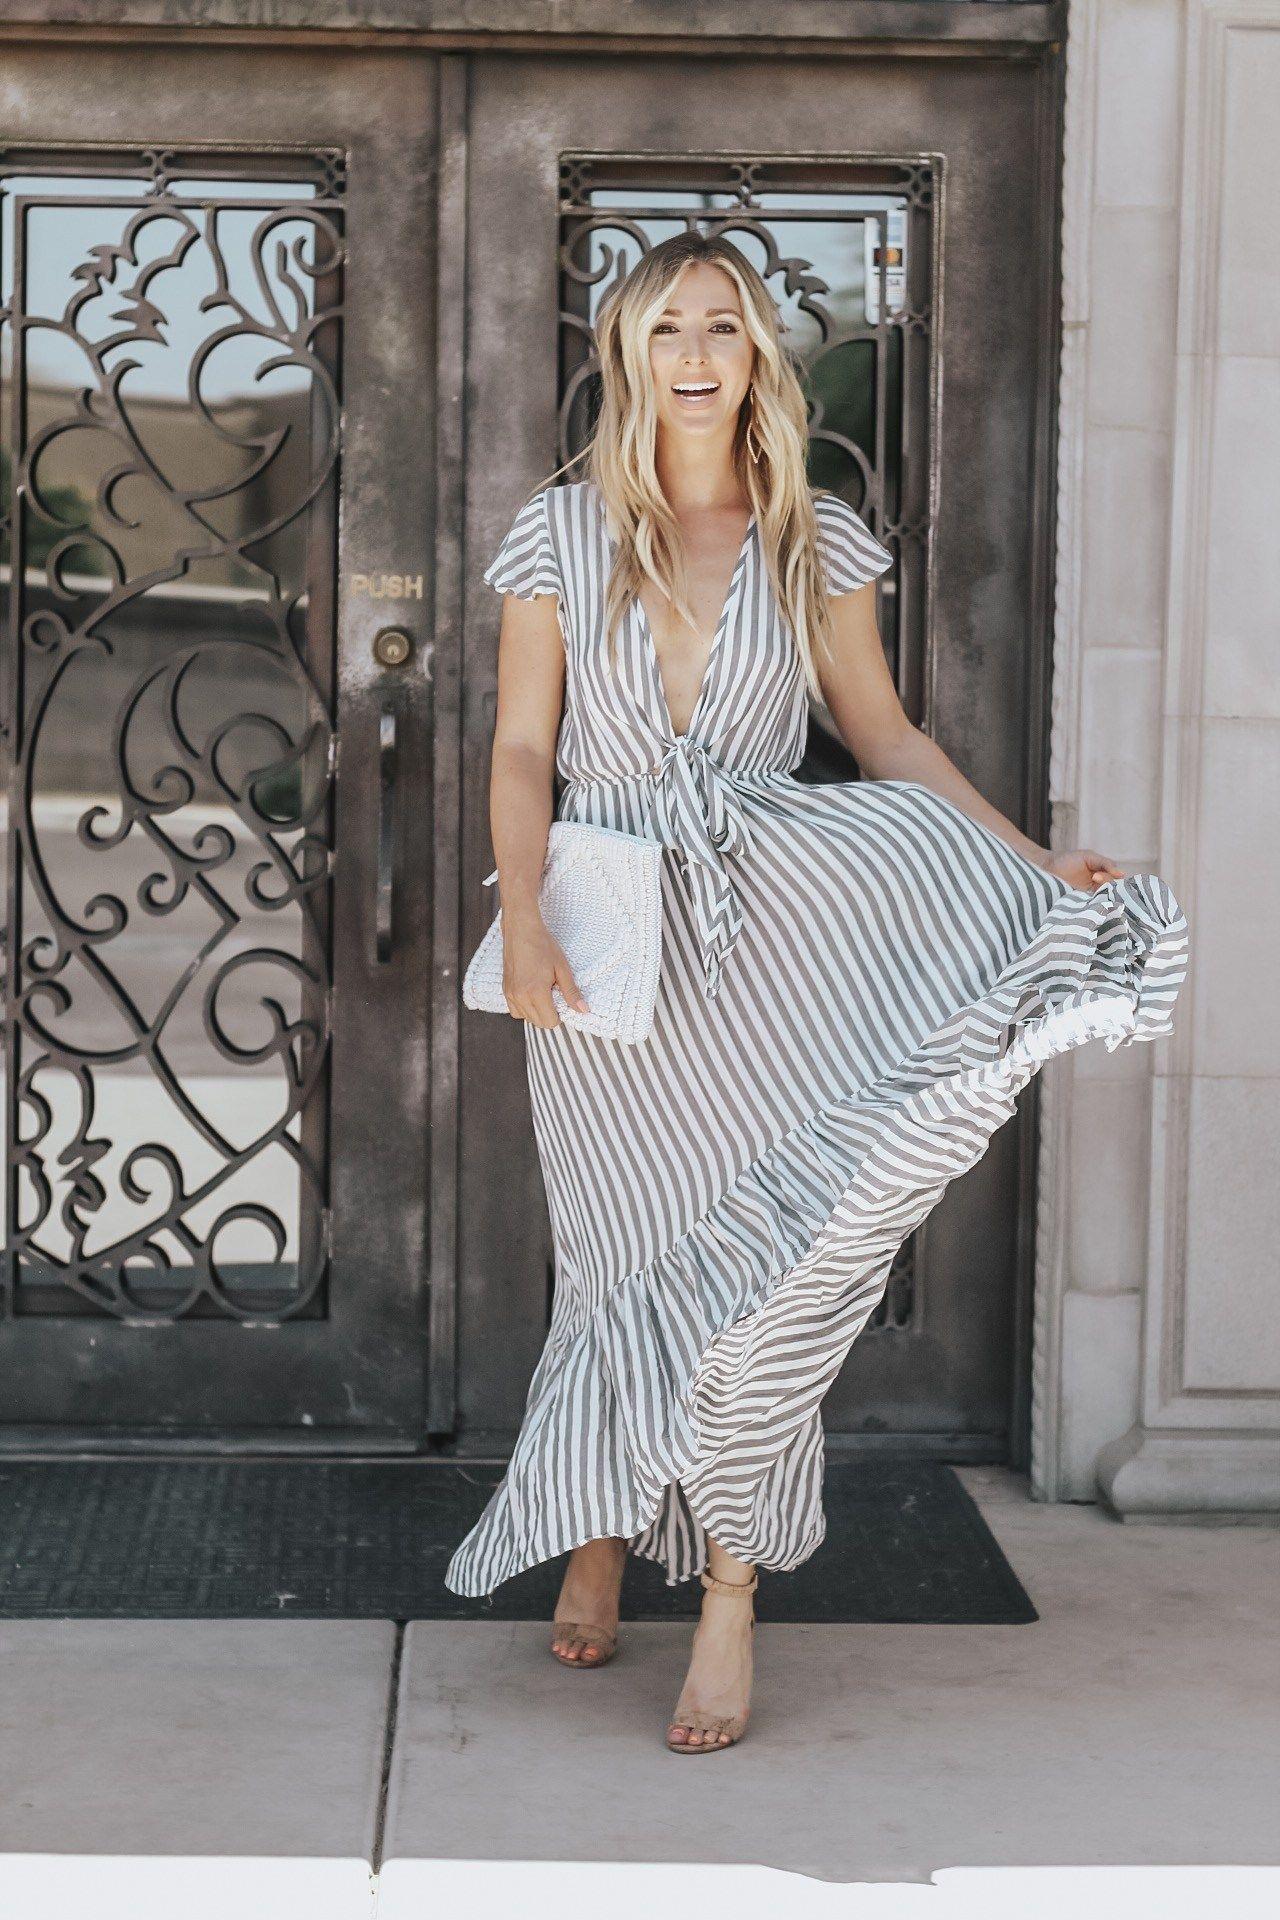 Vici Dolls Always Meliss Striped Dress Striped Maxi Dresses Spring Fashion Outfits Maxi Dress [ 1920 x 1280 Pixel ]